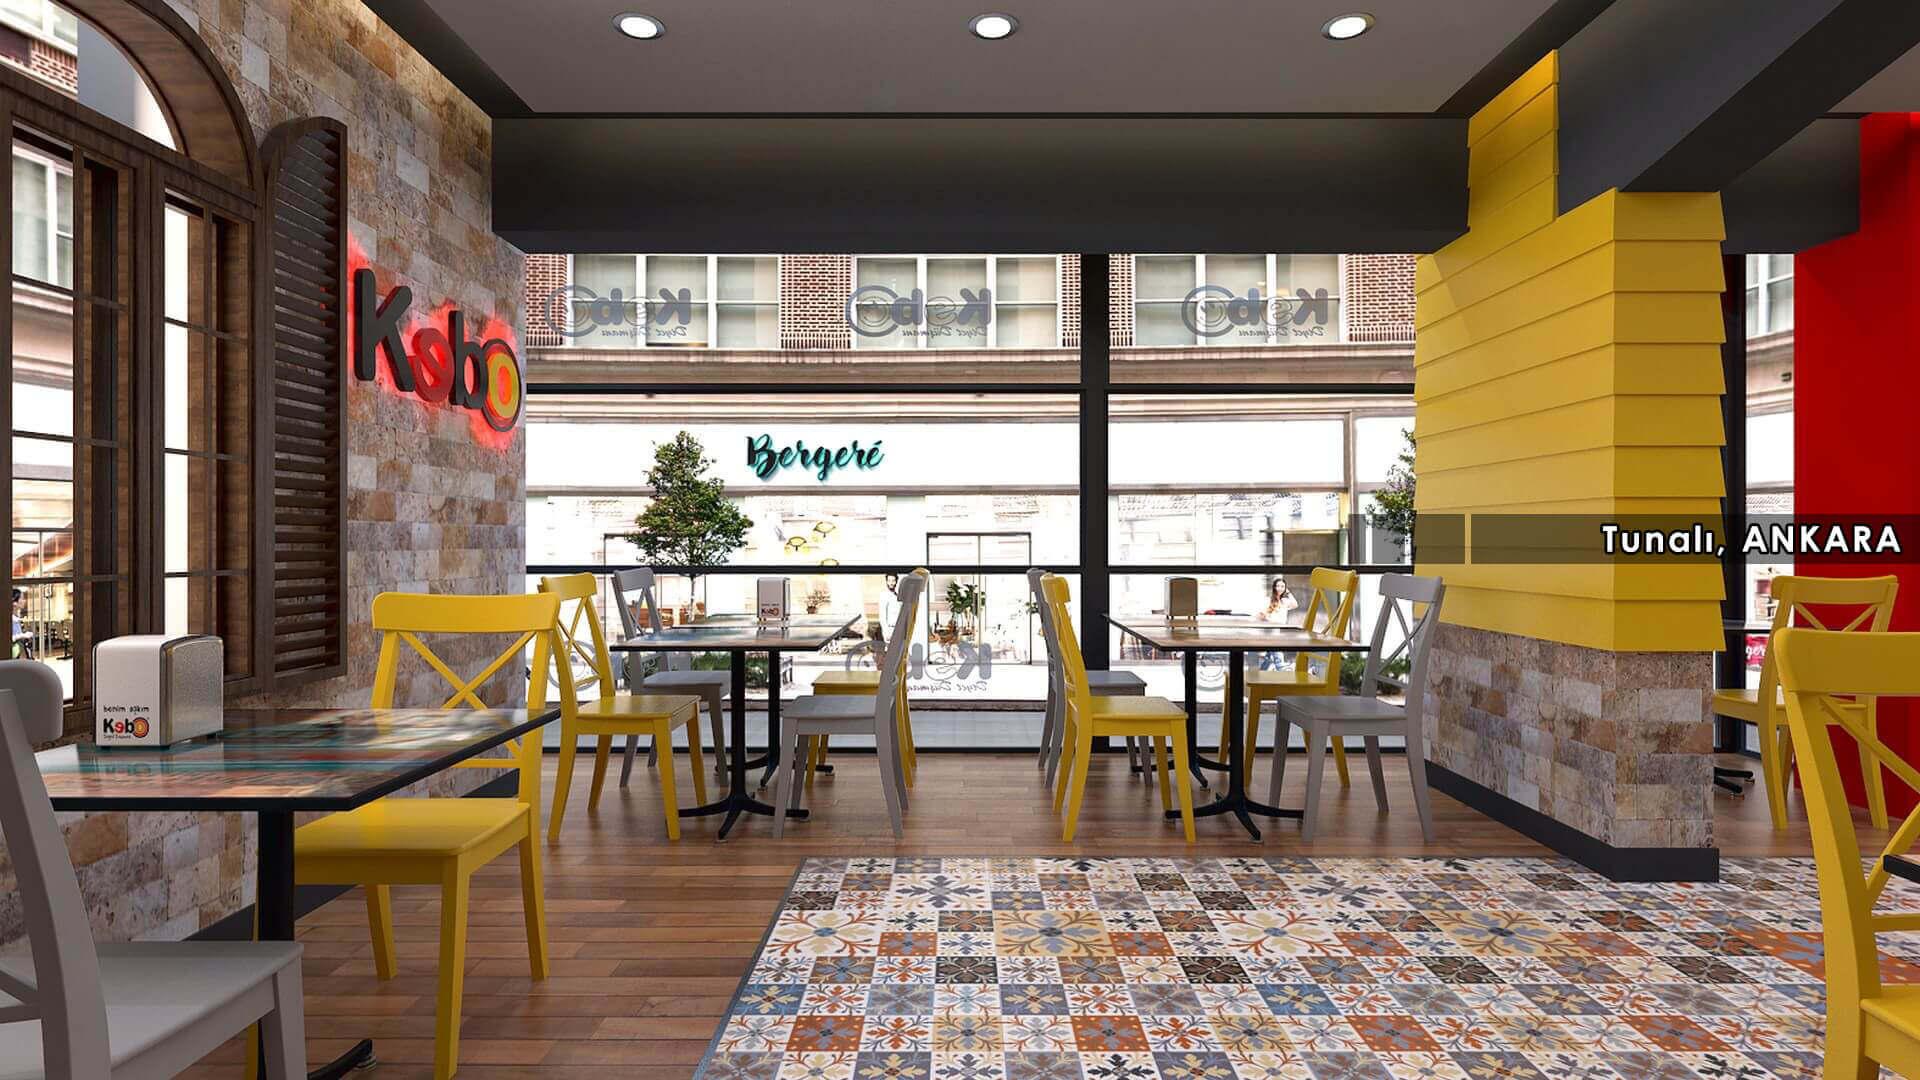 restaurant interior design 2112 Kebo 2016 Restaurants